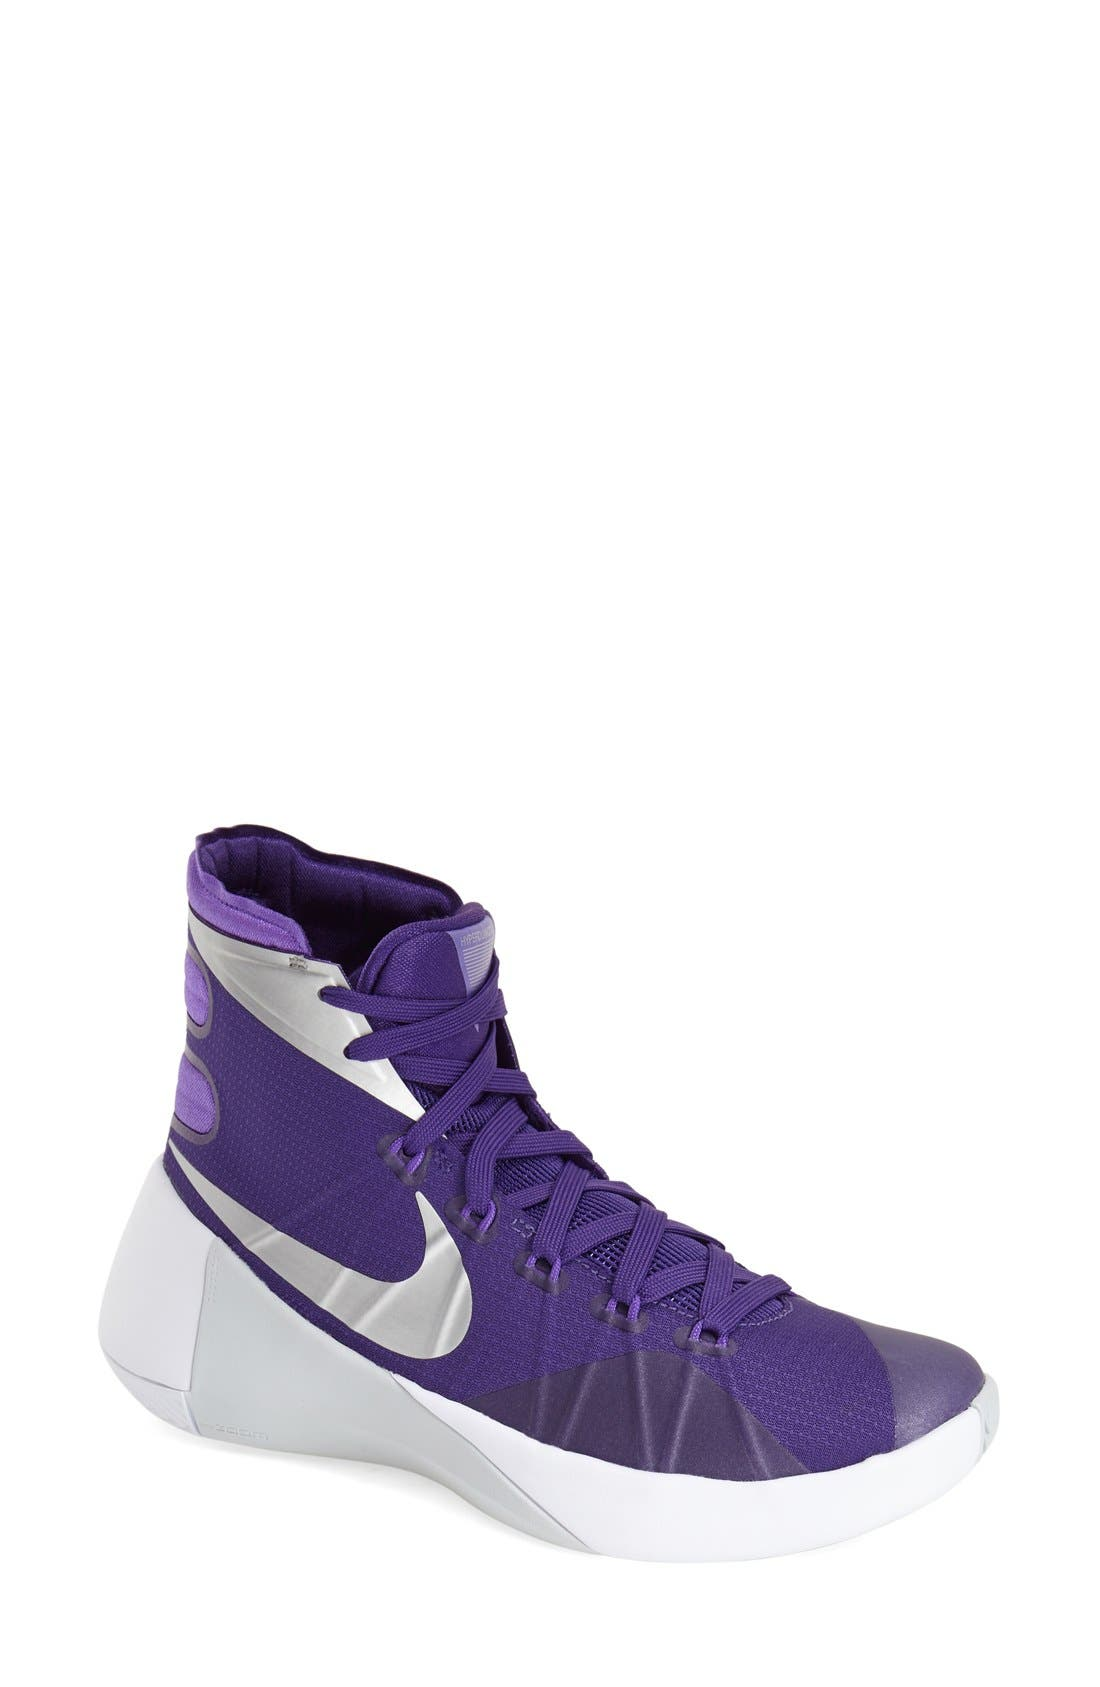 Main Image - Nike 'Hyperdunk 2015' Basketball Shoe (Women)